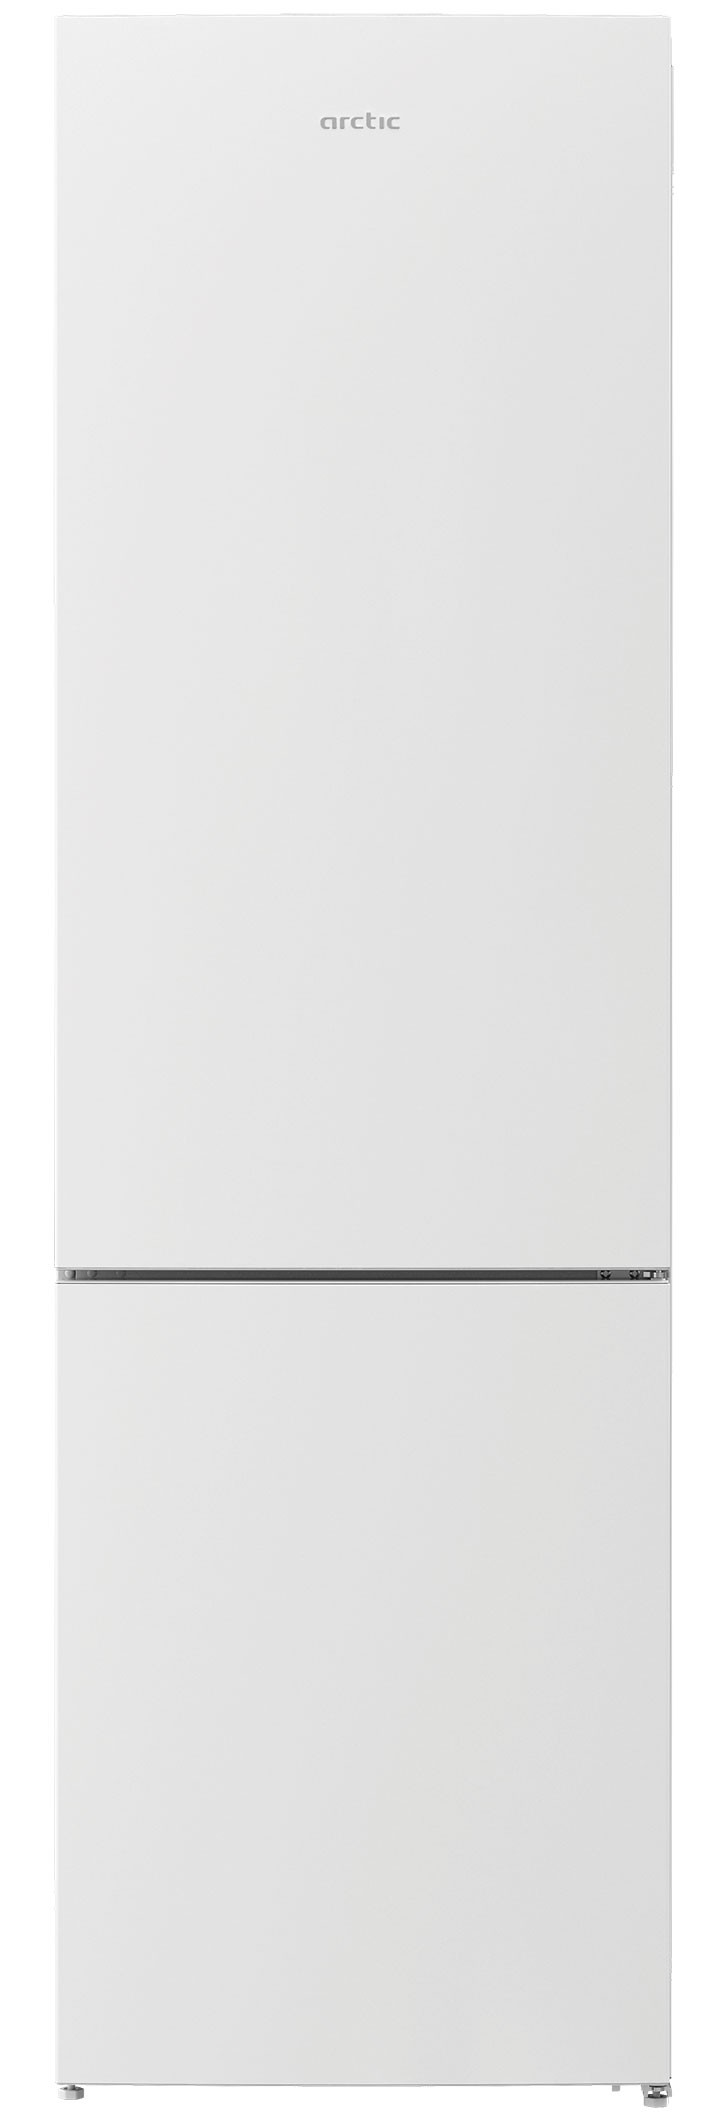 Combina frigorifica, Arctic, AK60360M30W, 339 l, Clasa F, H 200,9  cm, Alb